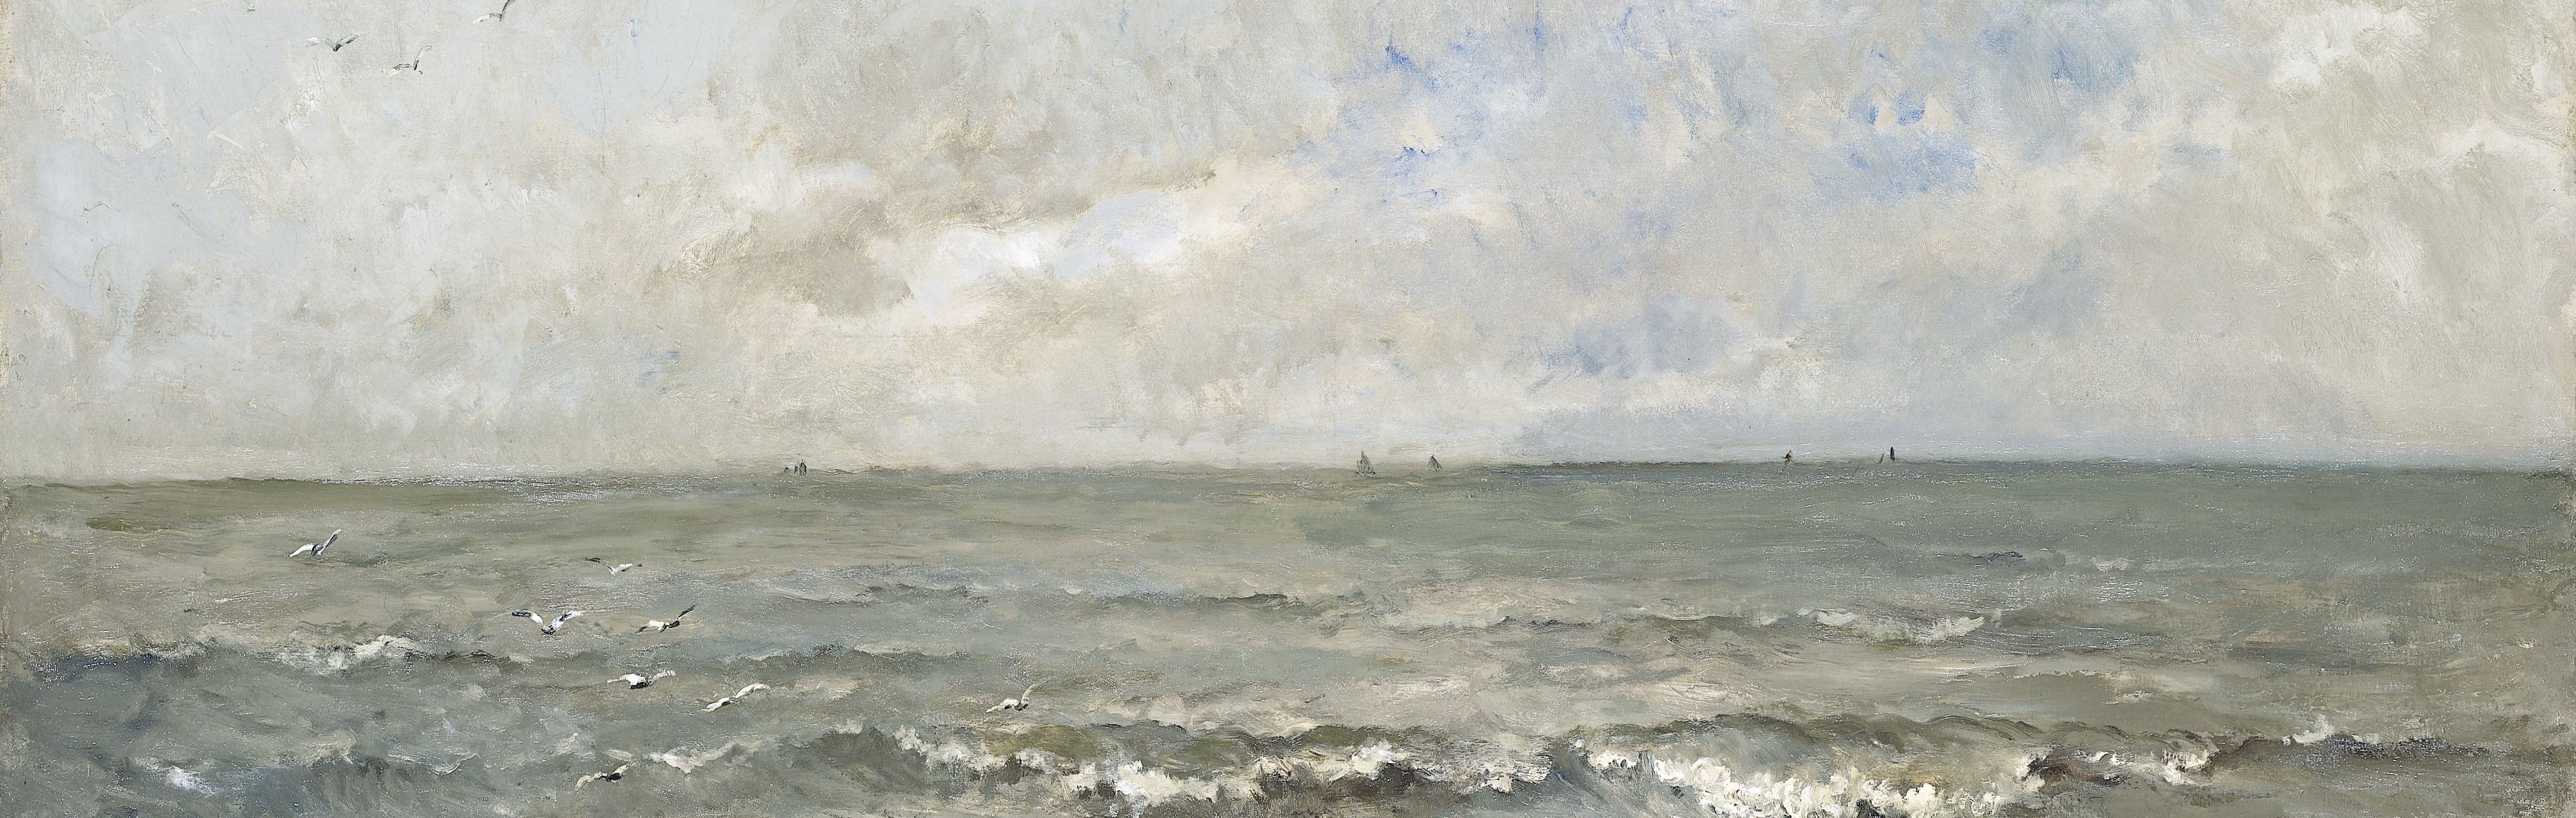 Zeegezicht, Charles-François Daubigny, 1876_crop